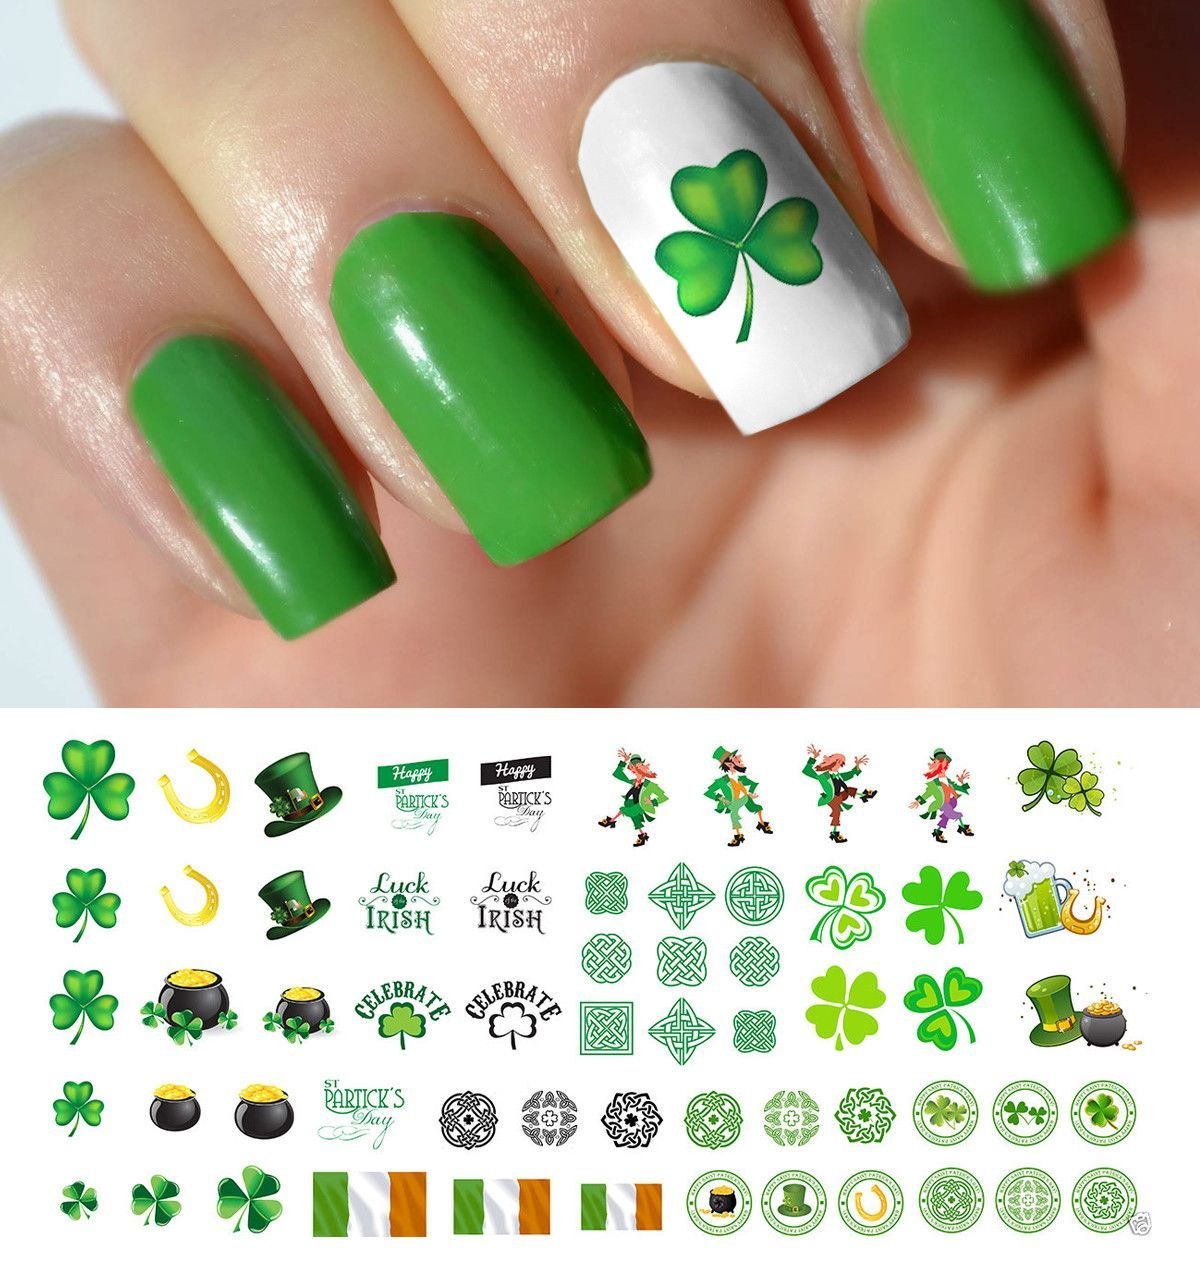 St. Patrick\'s Day Nail Art Decals Set #1 | Diseños de uñas